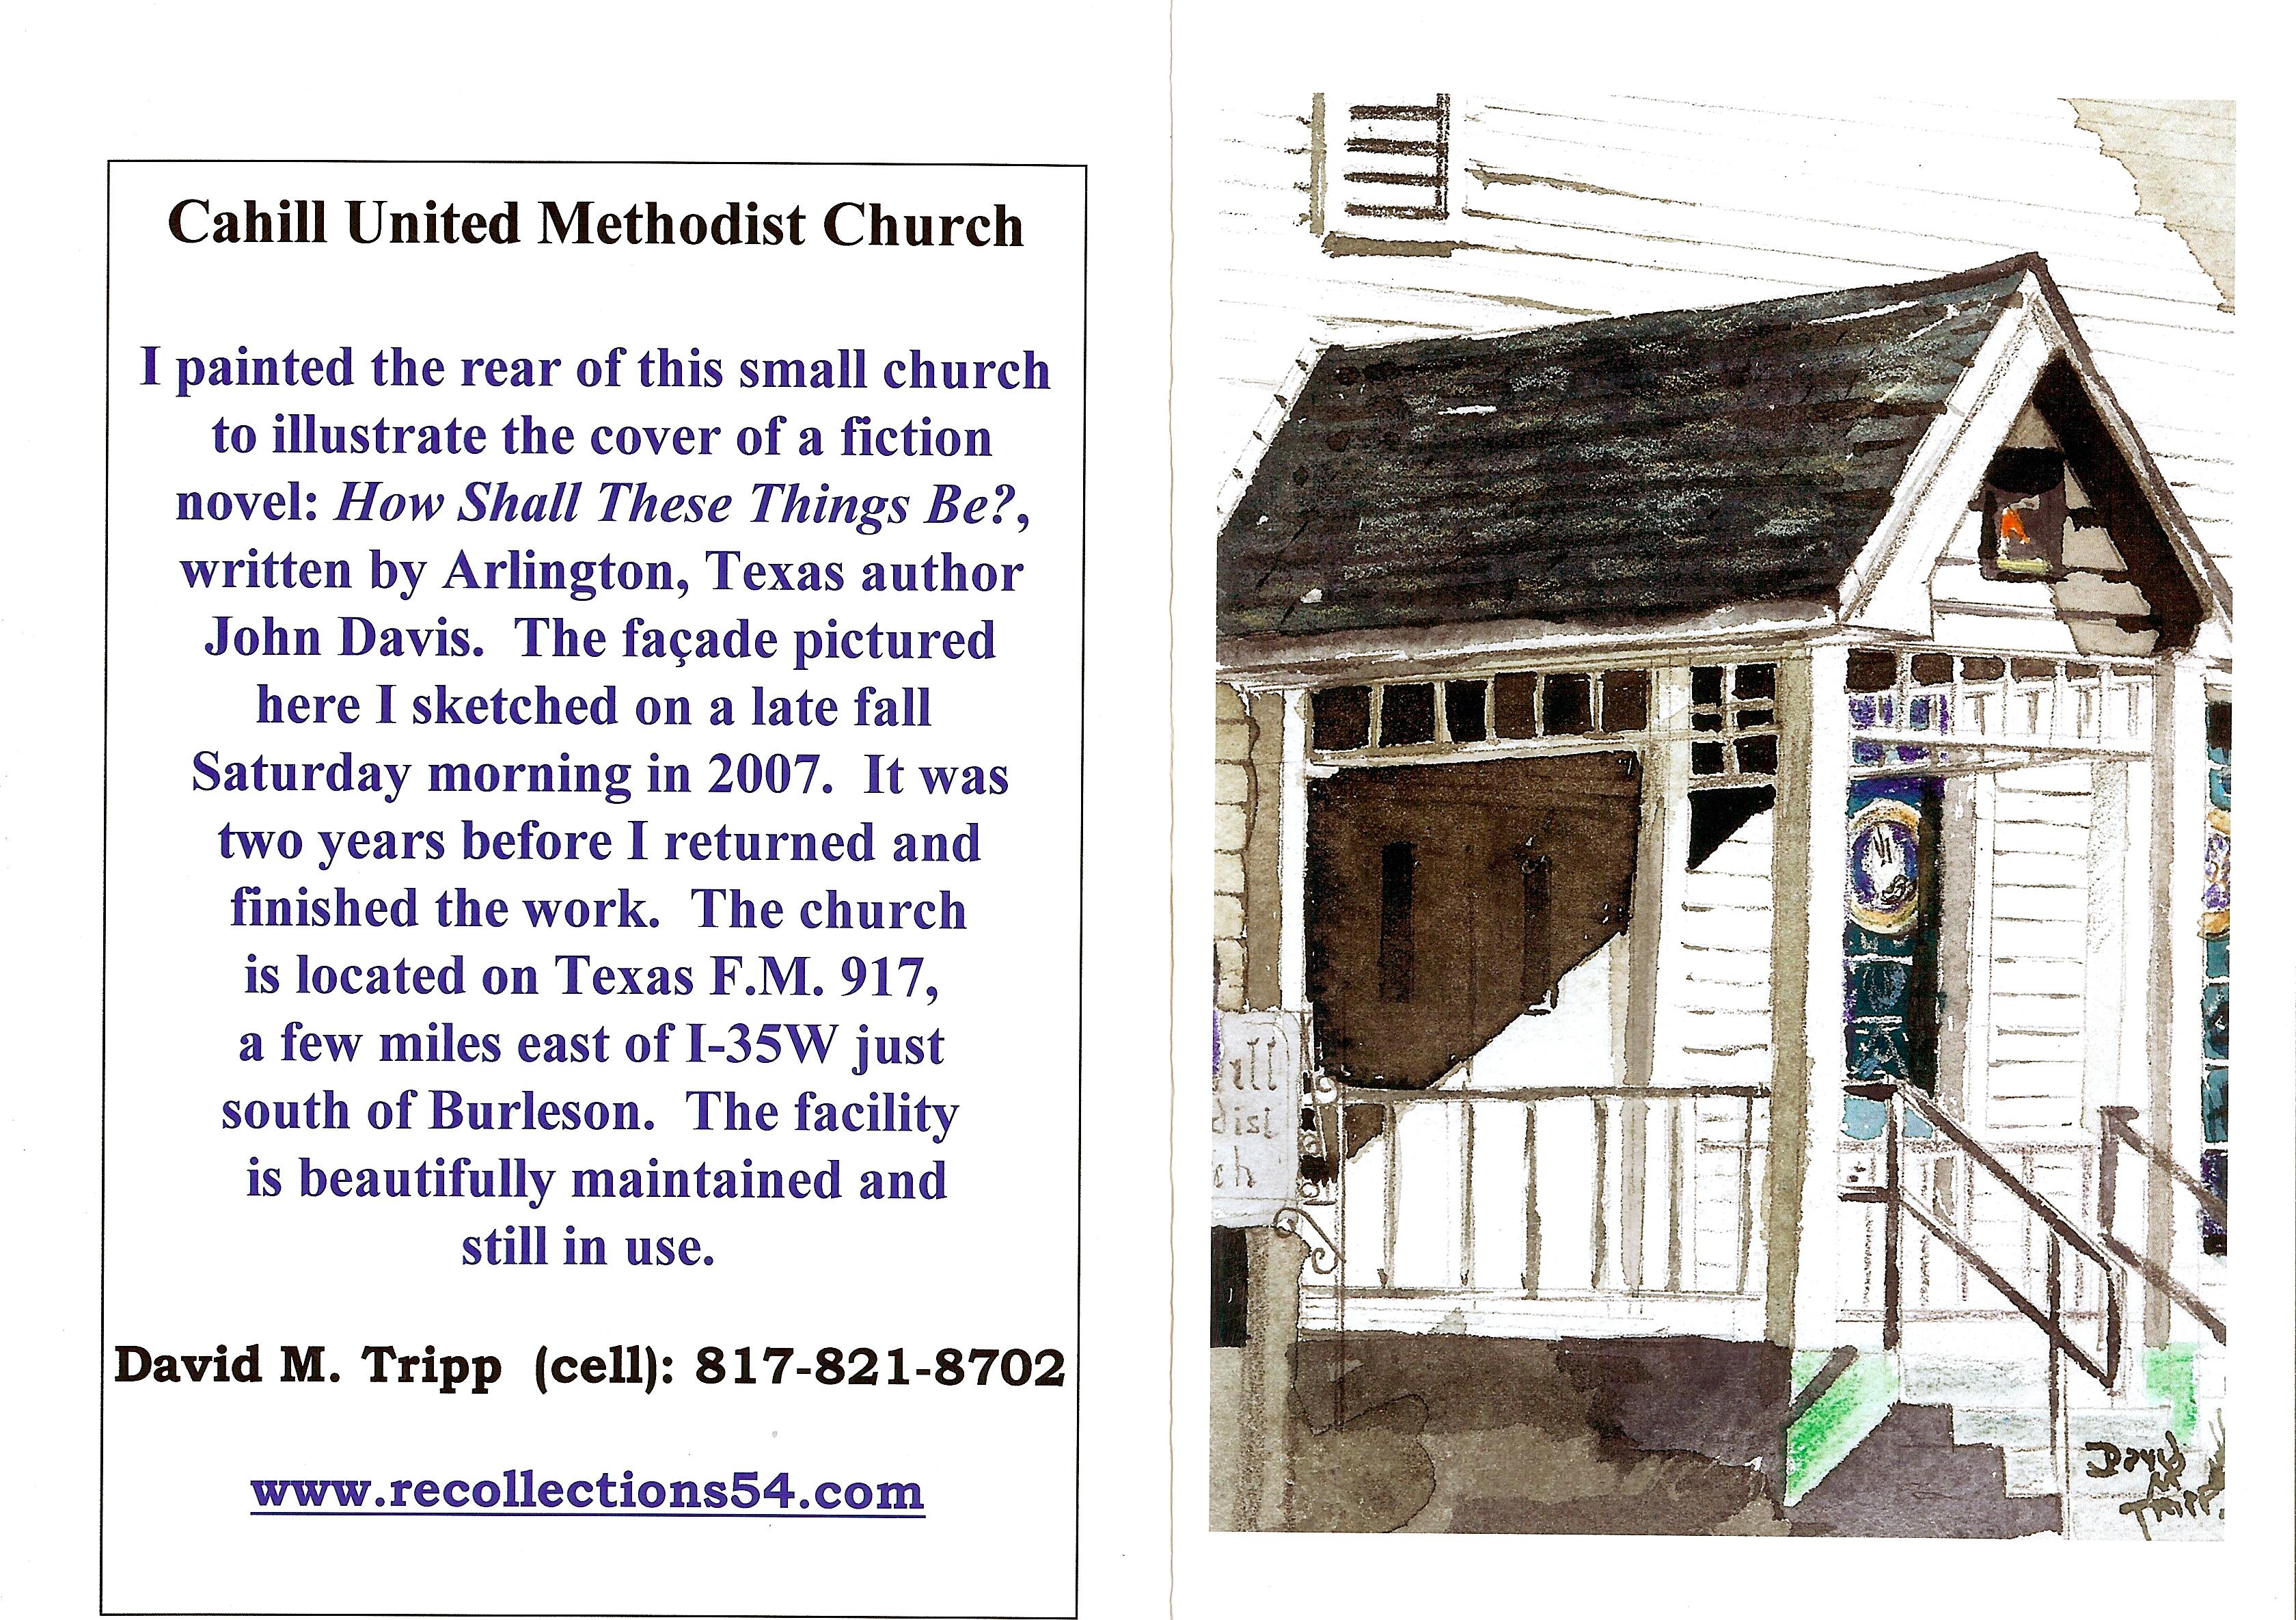 Facade of small Methodist Church south of Fort Worth, near Joshua, Texas